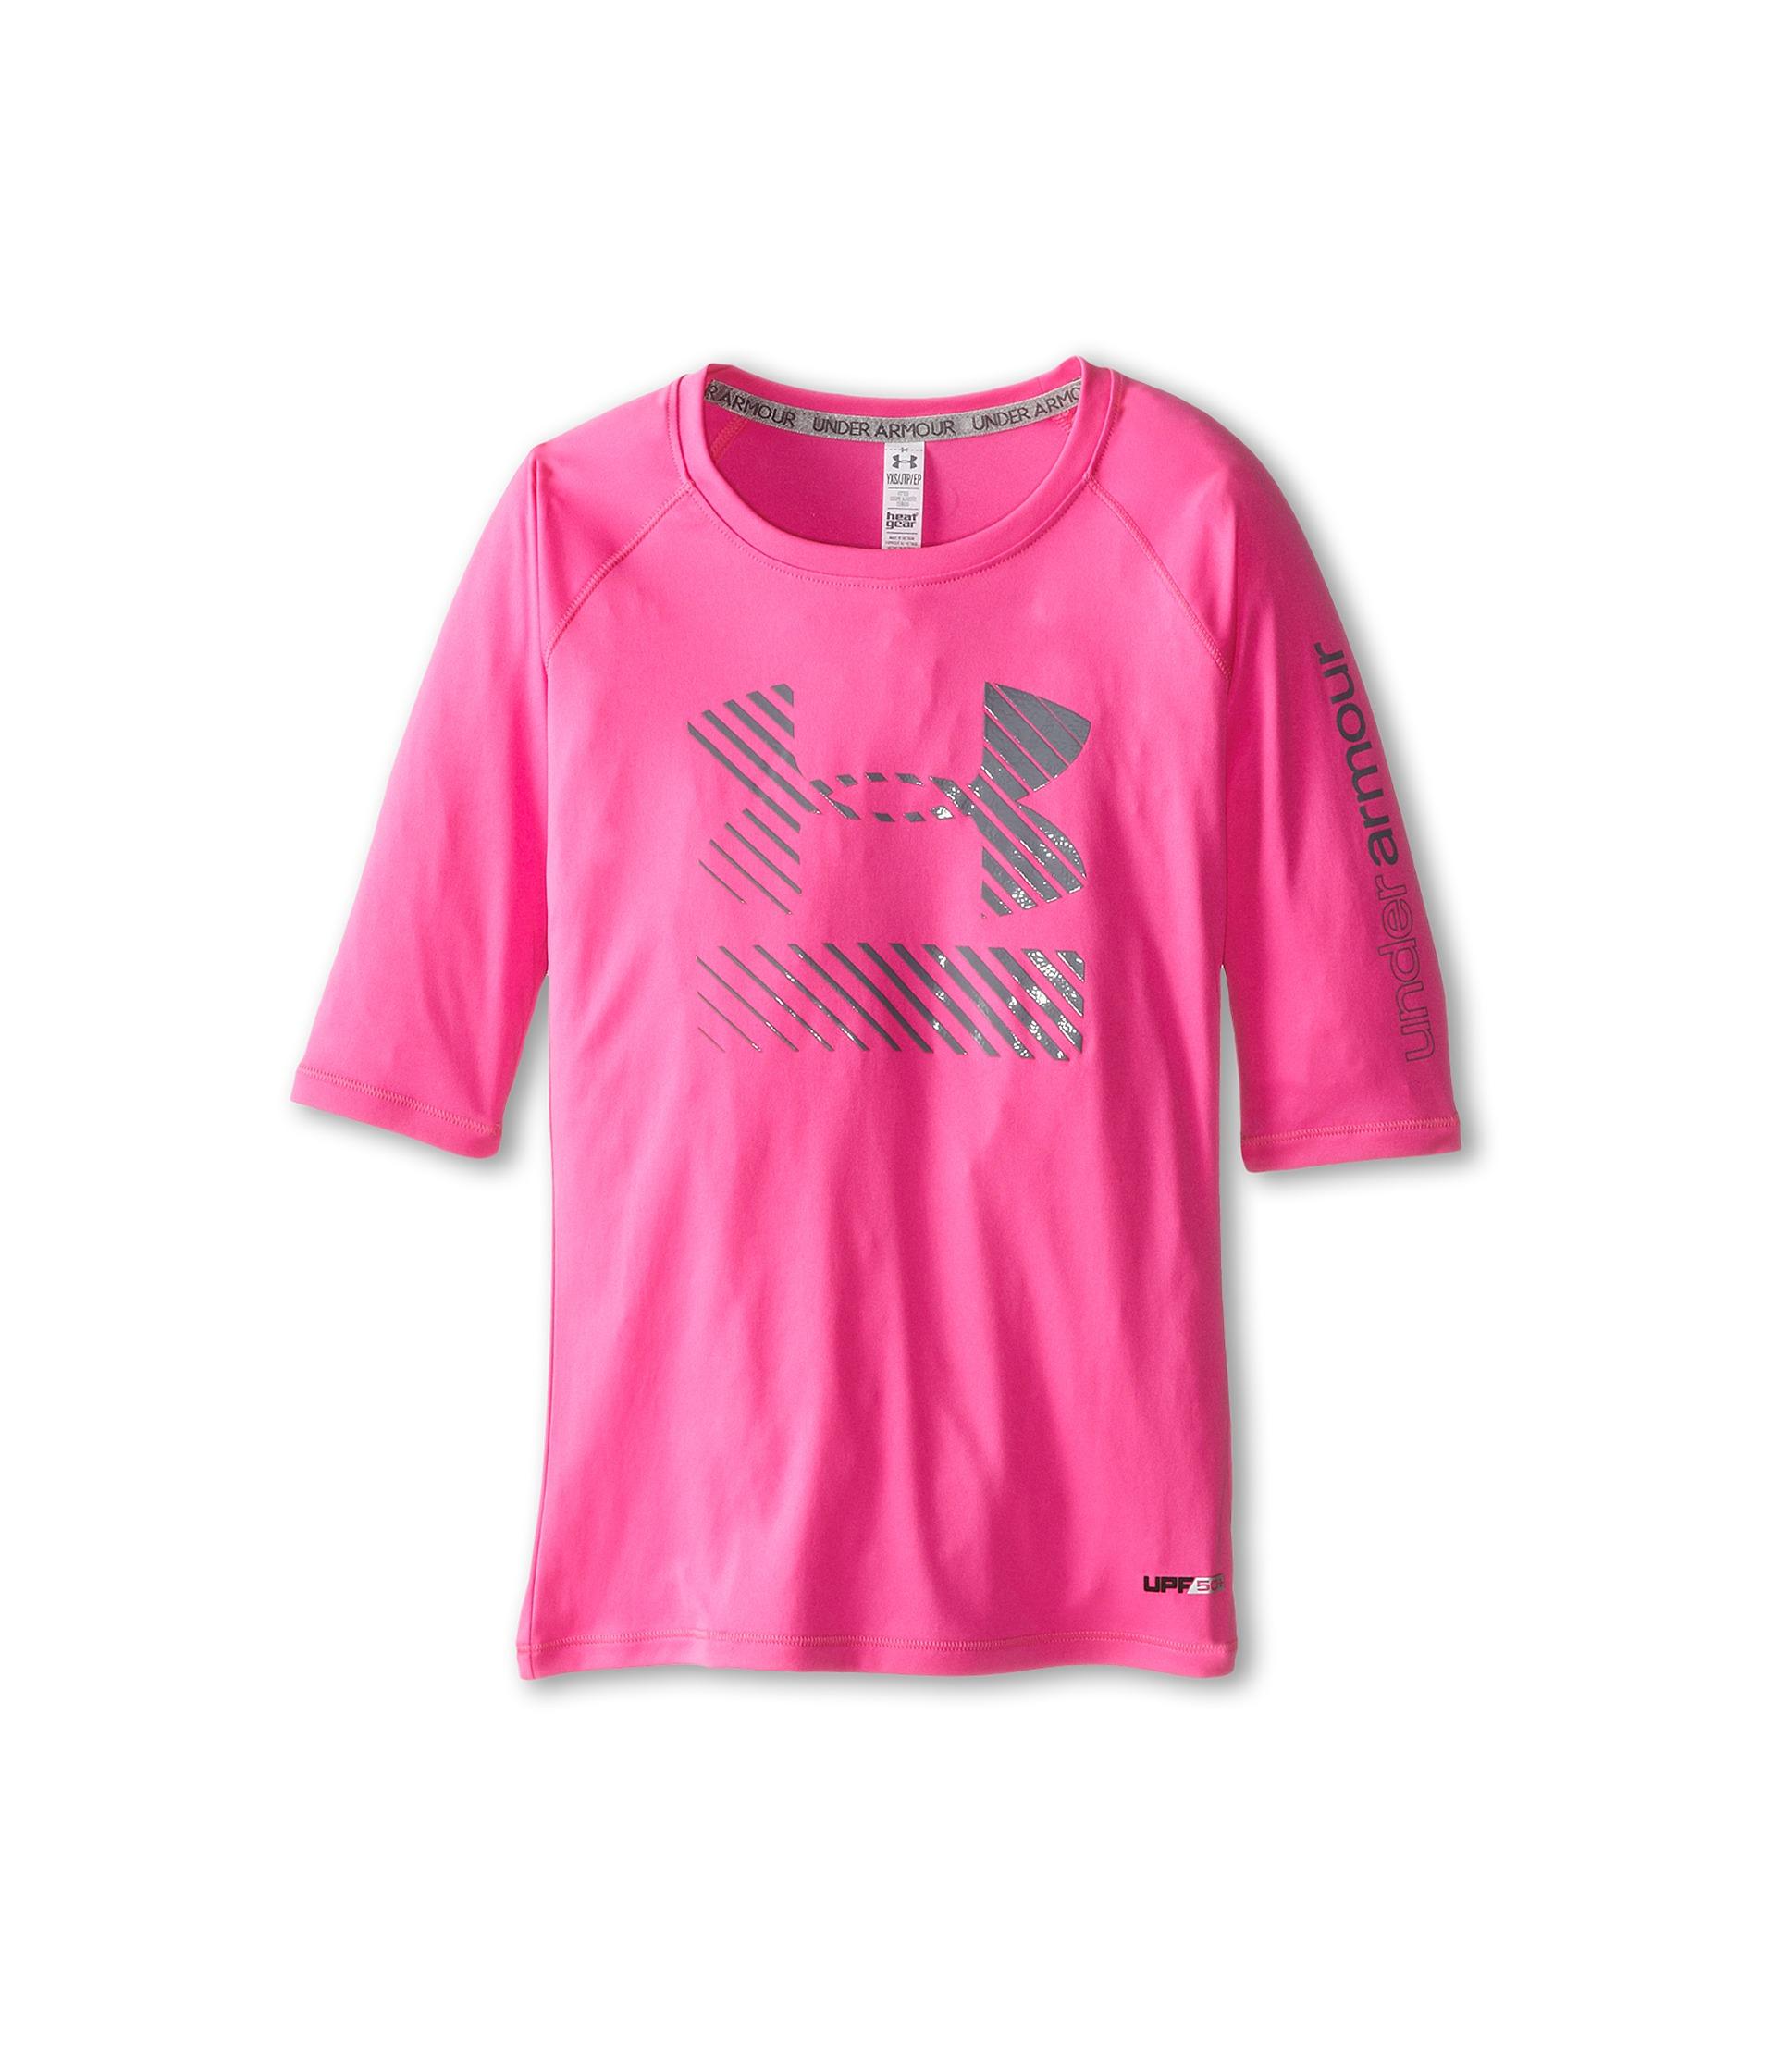 Under armour kids upf 3 4 sleeve shirt big kids for Under armour shirts for kids